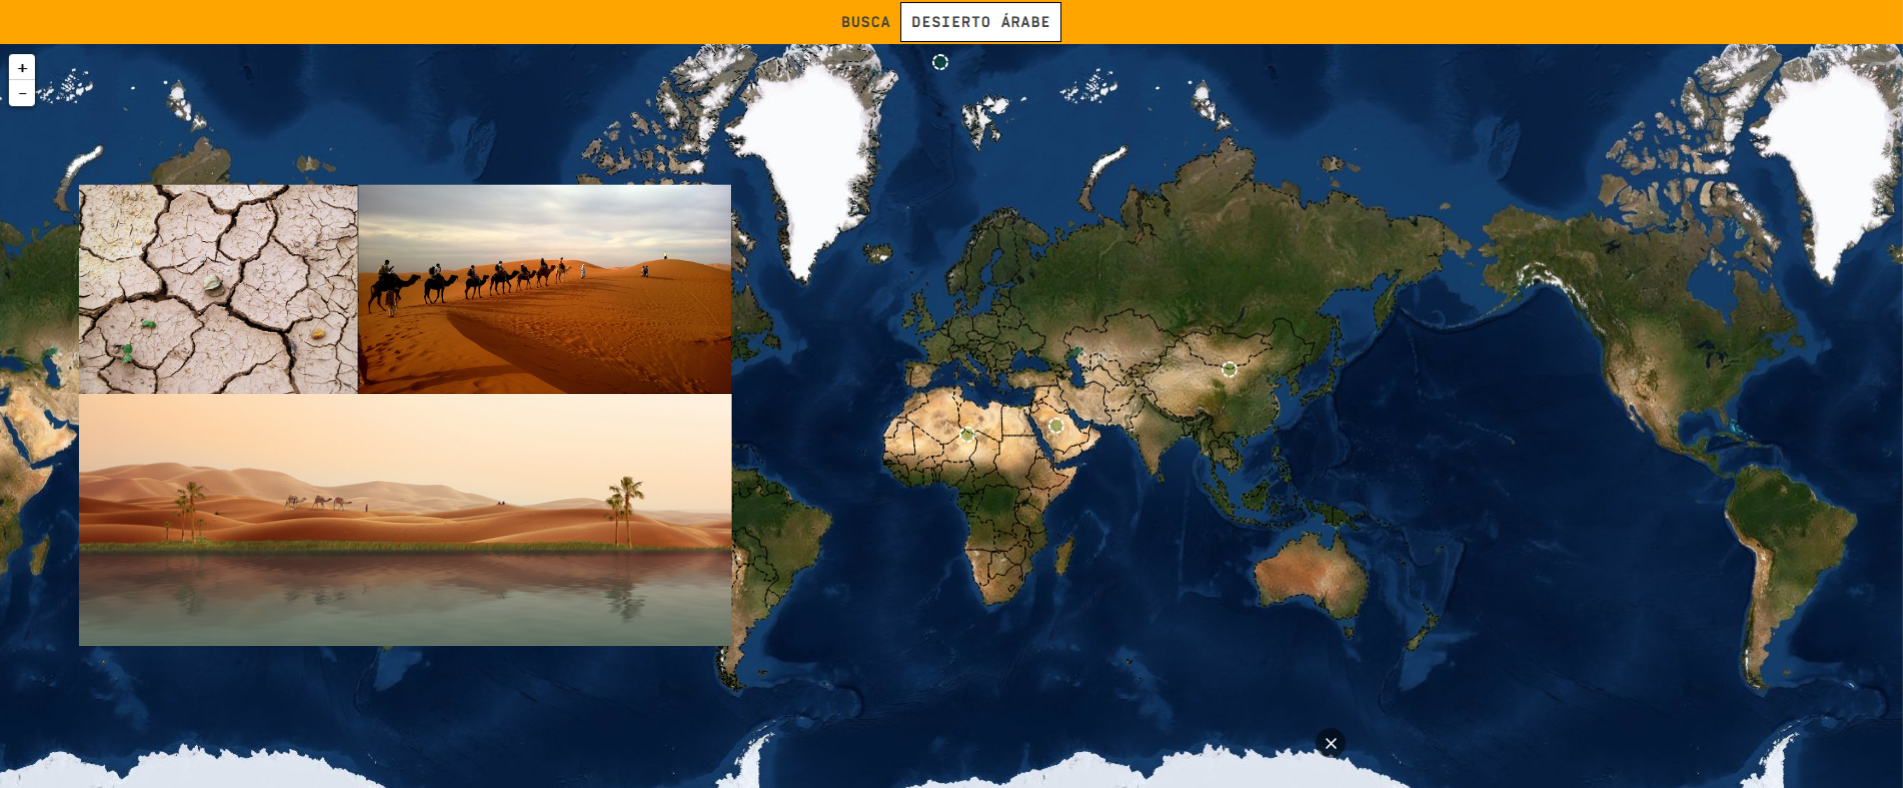 Deserts of the world - Easy Level